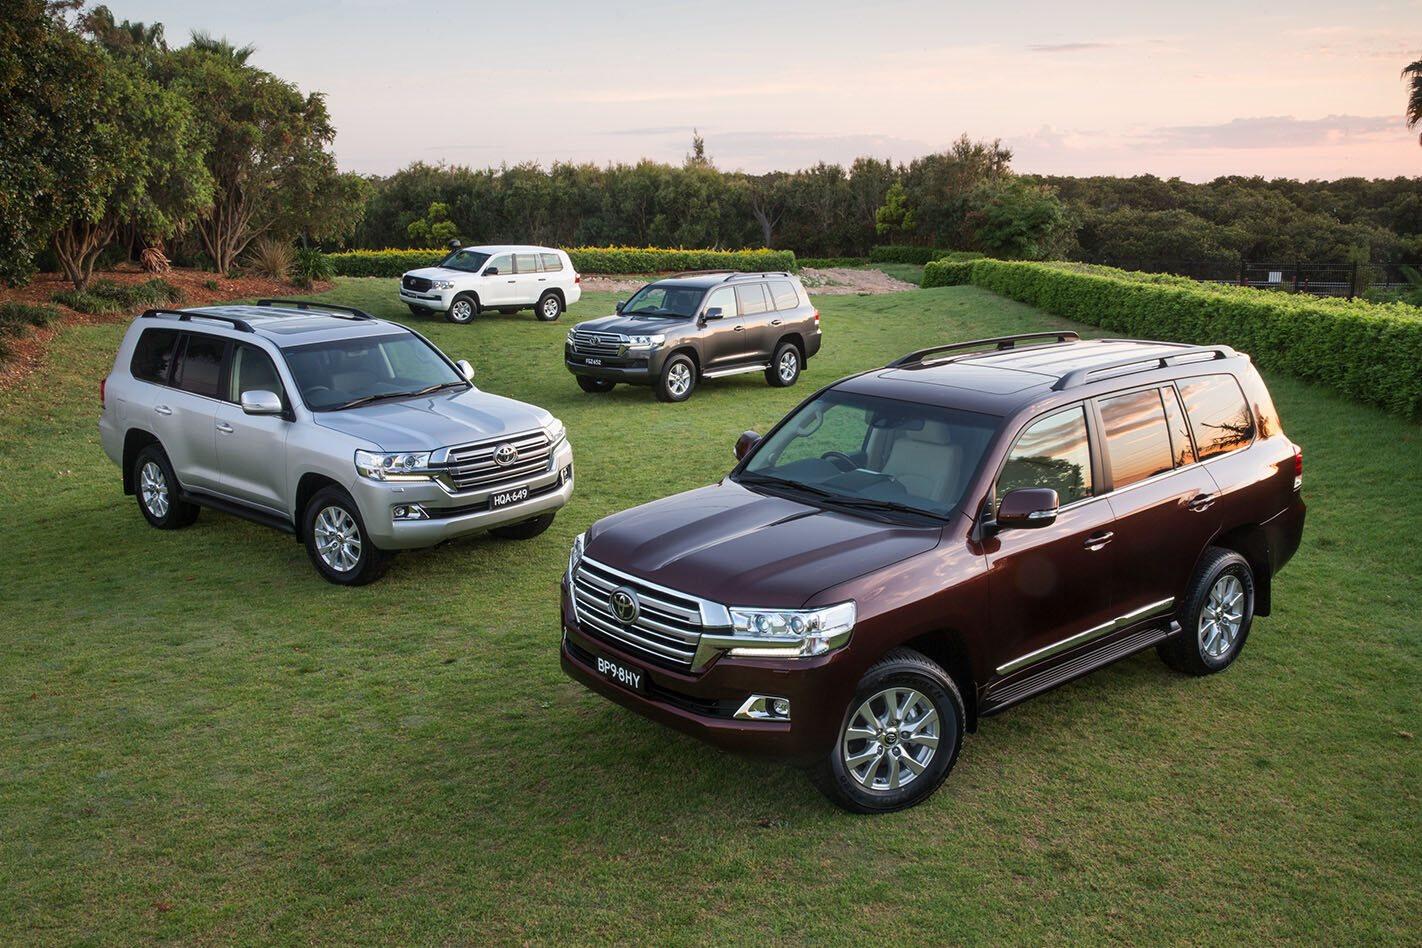 Toyota LandCruiser range